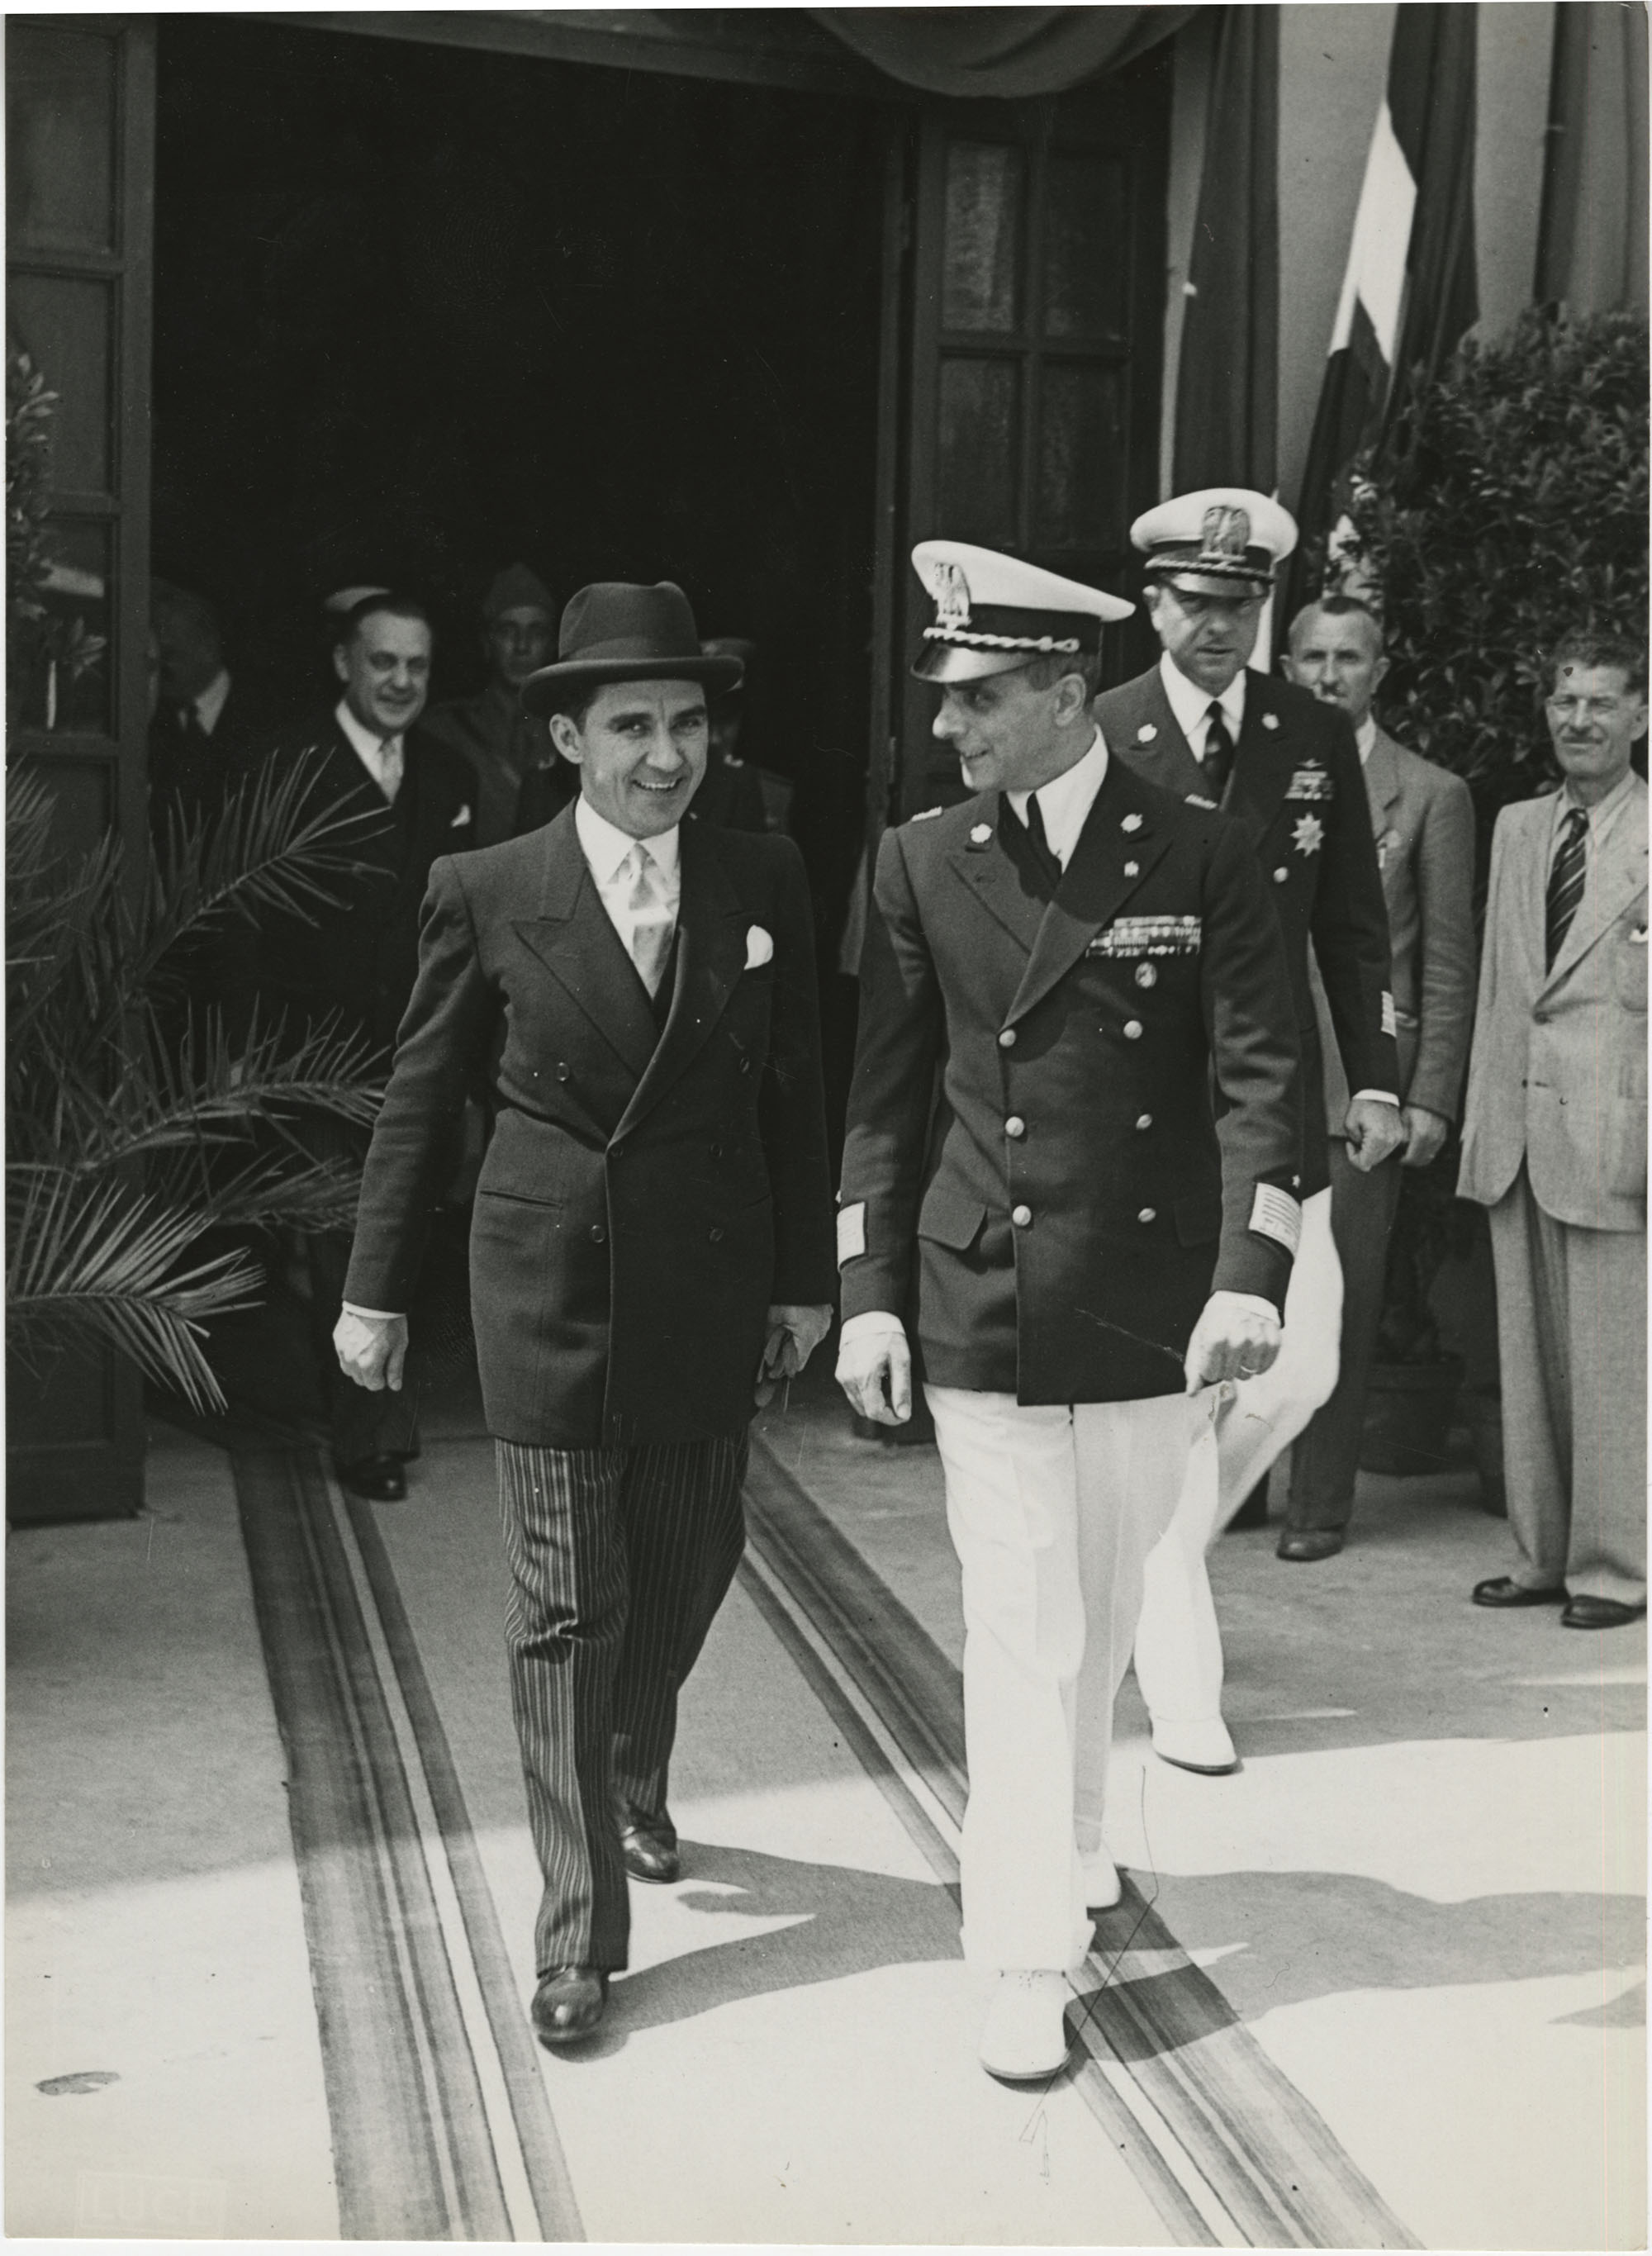 Mihai Antonescu's visit to Benito Mussolini, Photograph 33